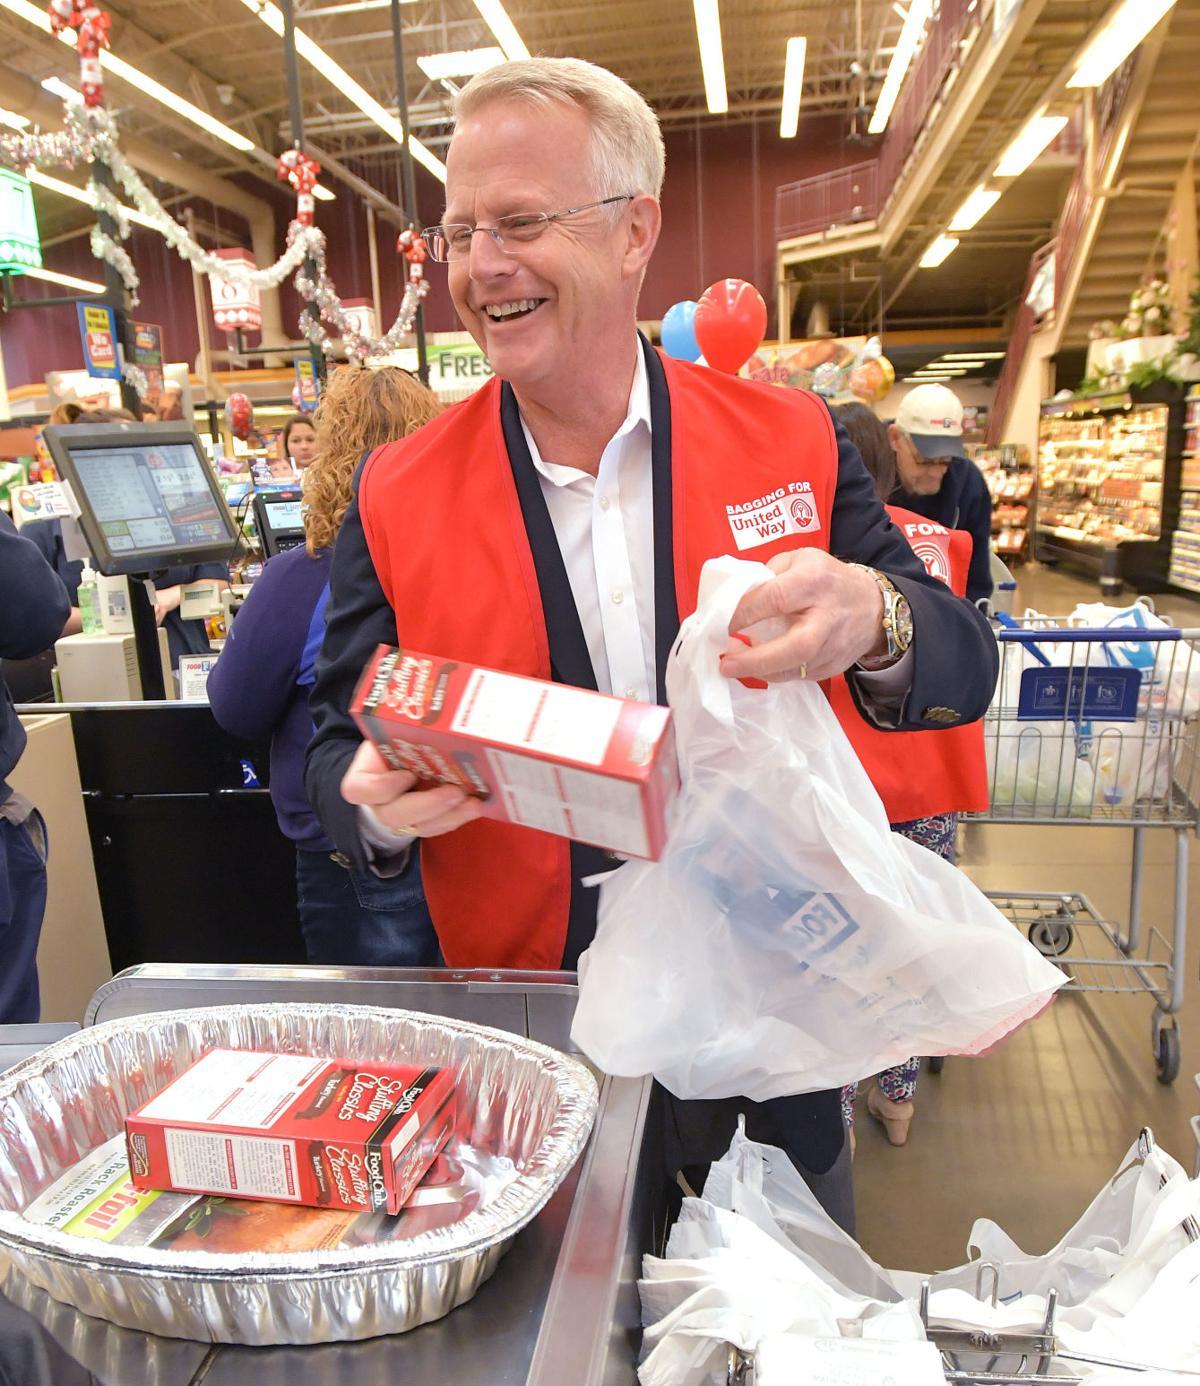 Celebrities Help Bag Groceries For Thanksgiving Fundraiser